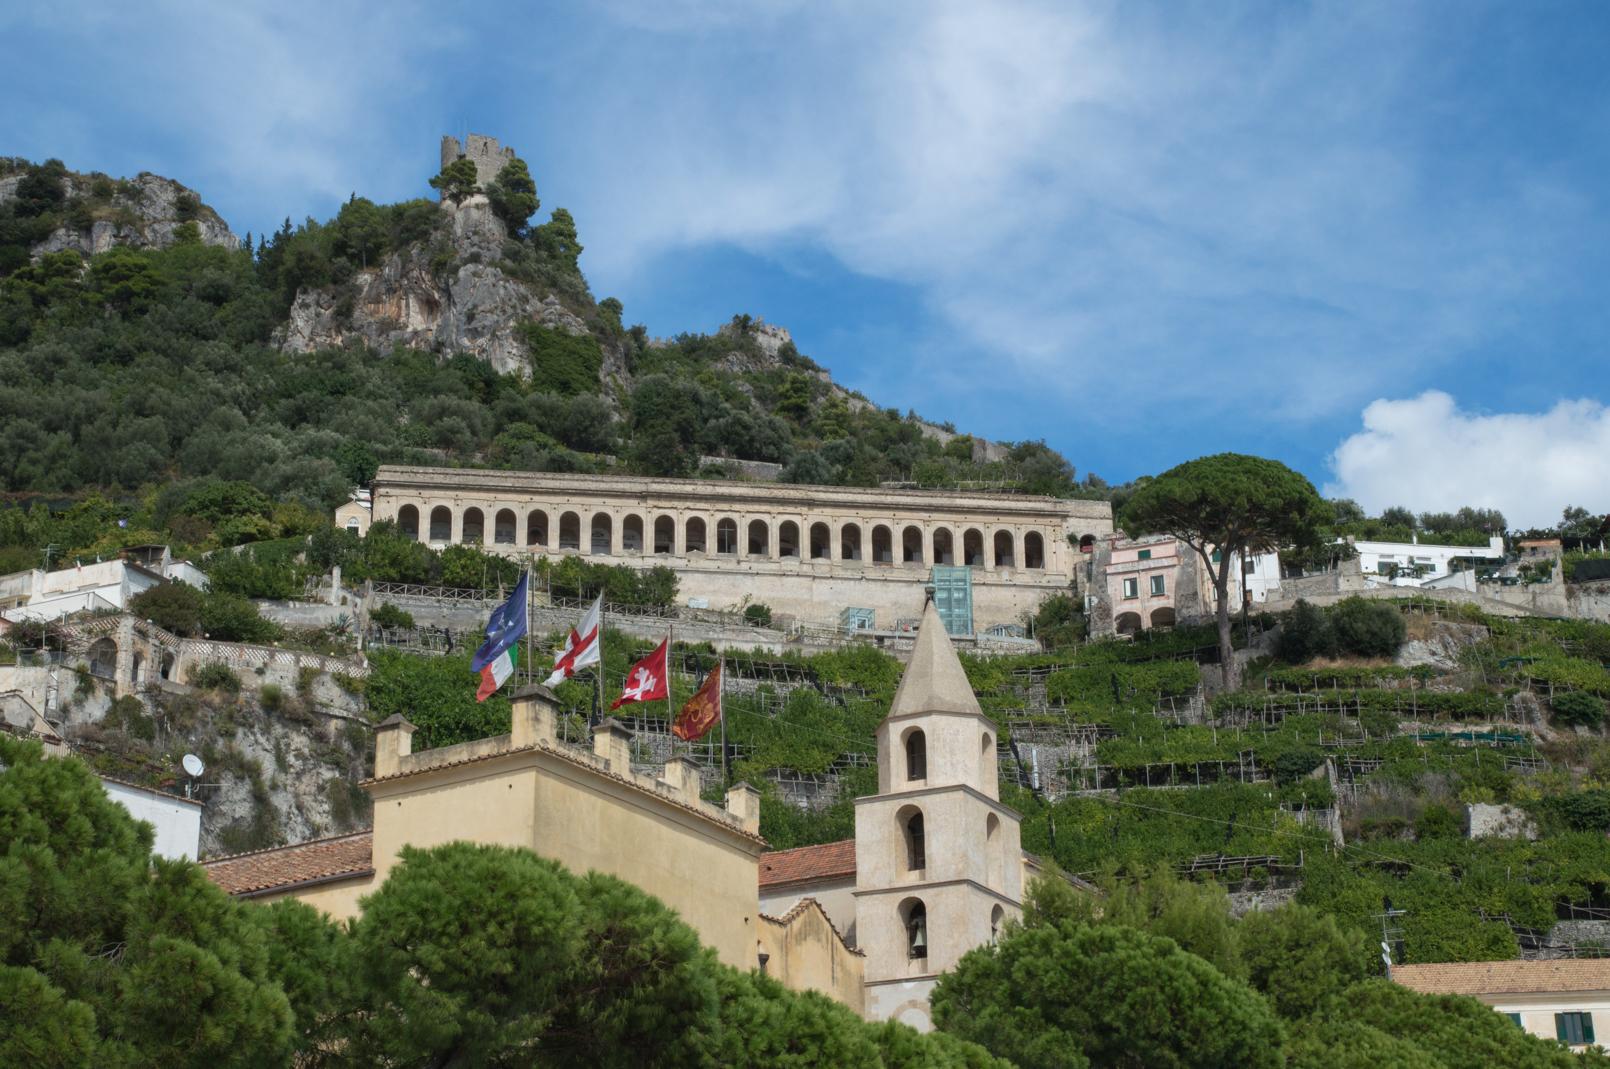 Torre dello Ziro Amalfi